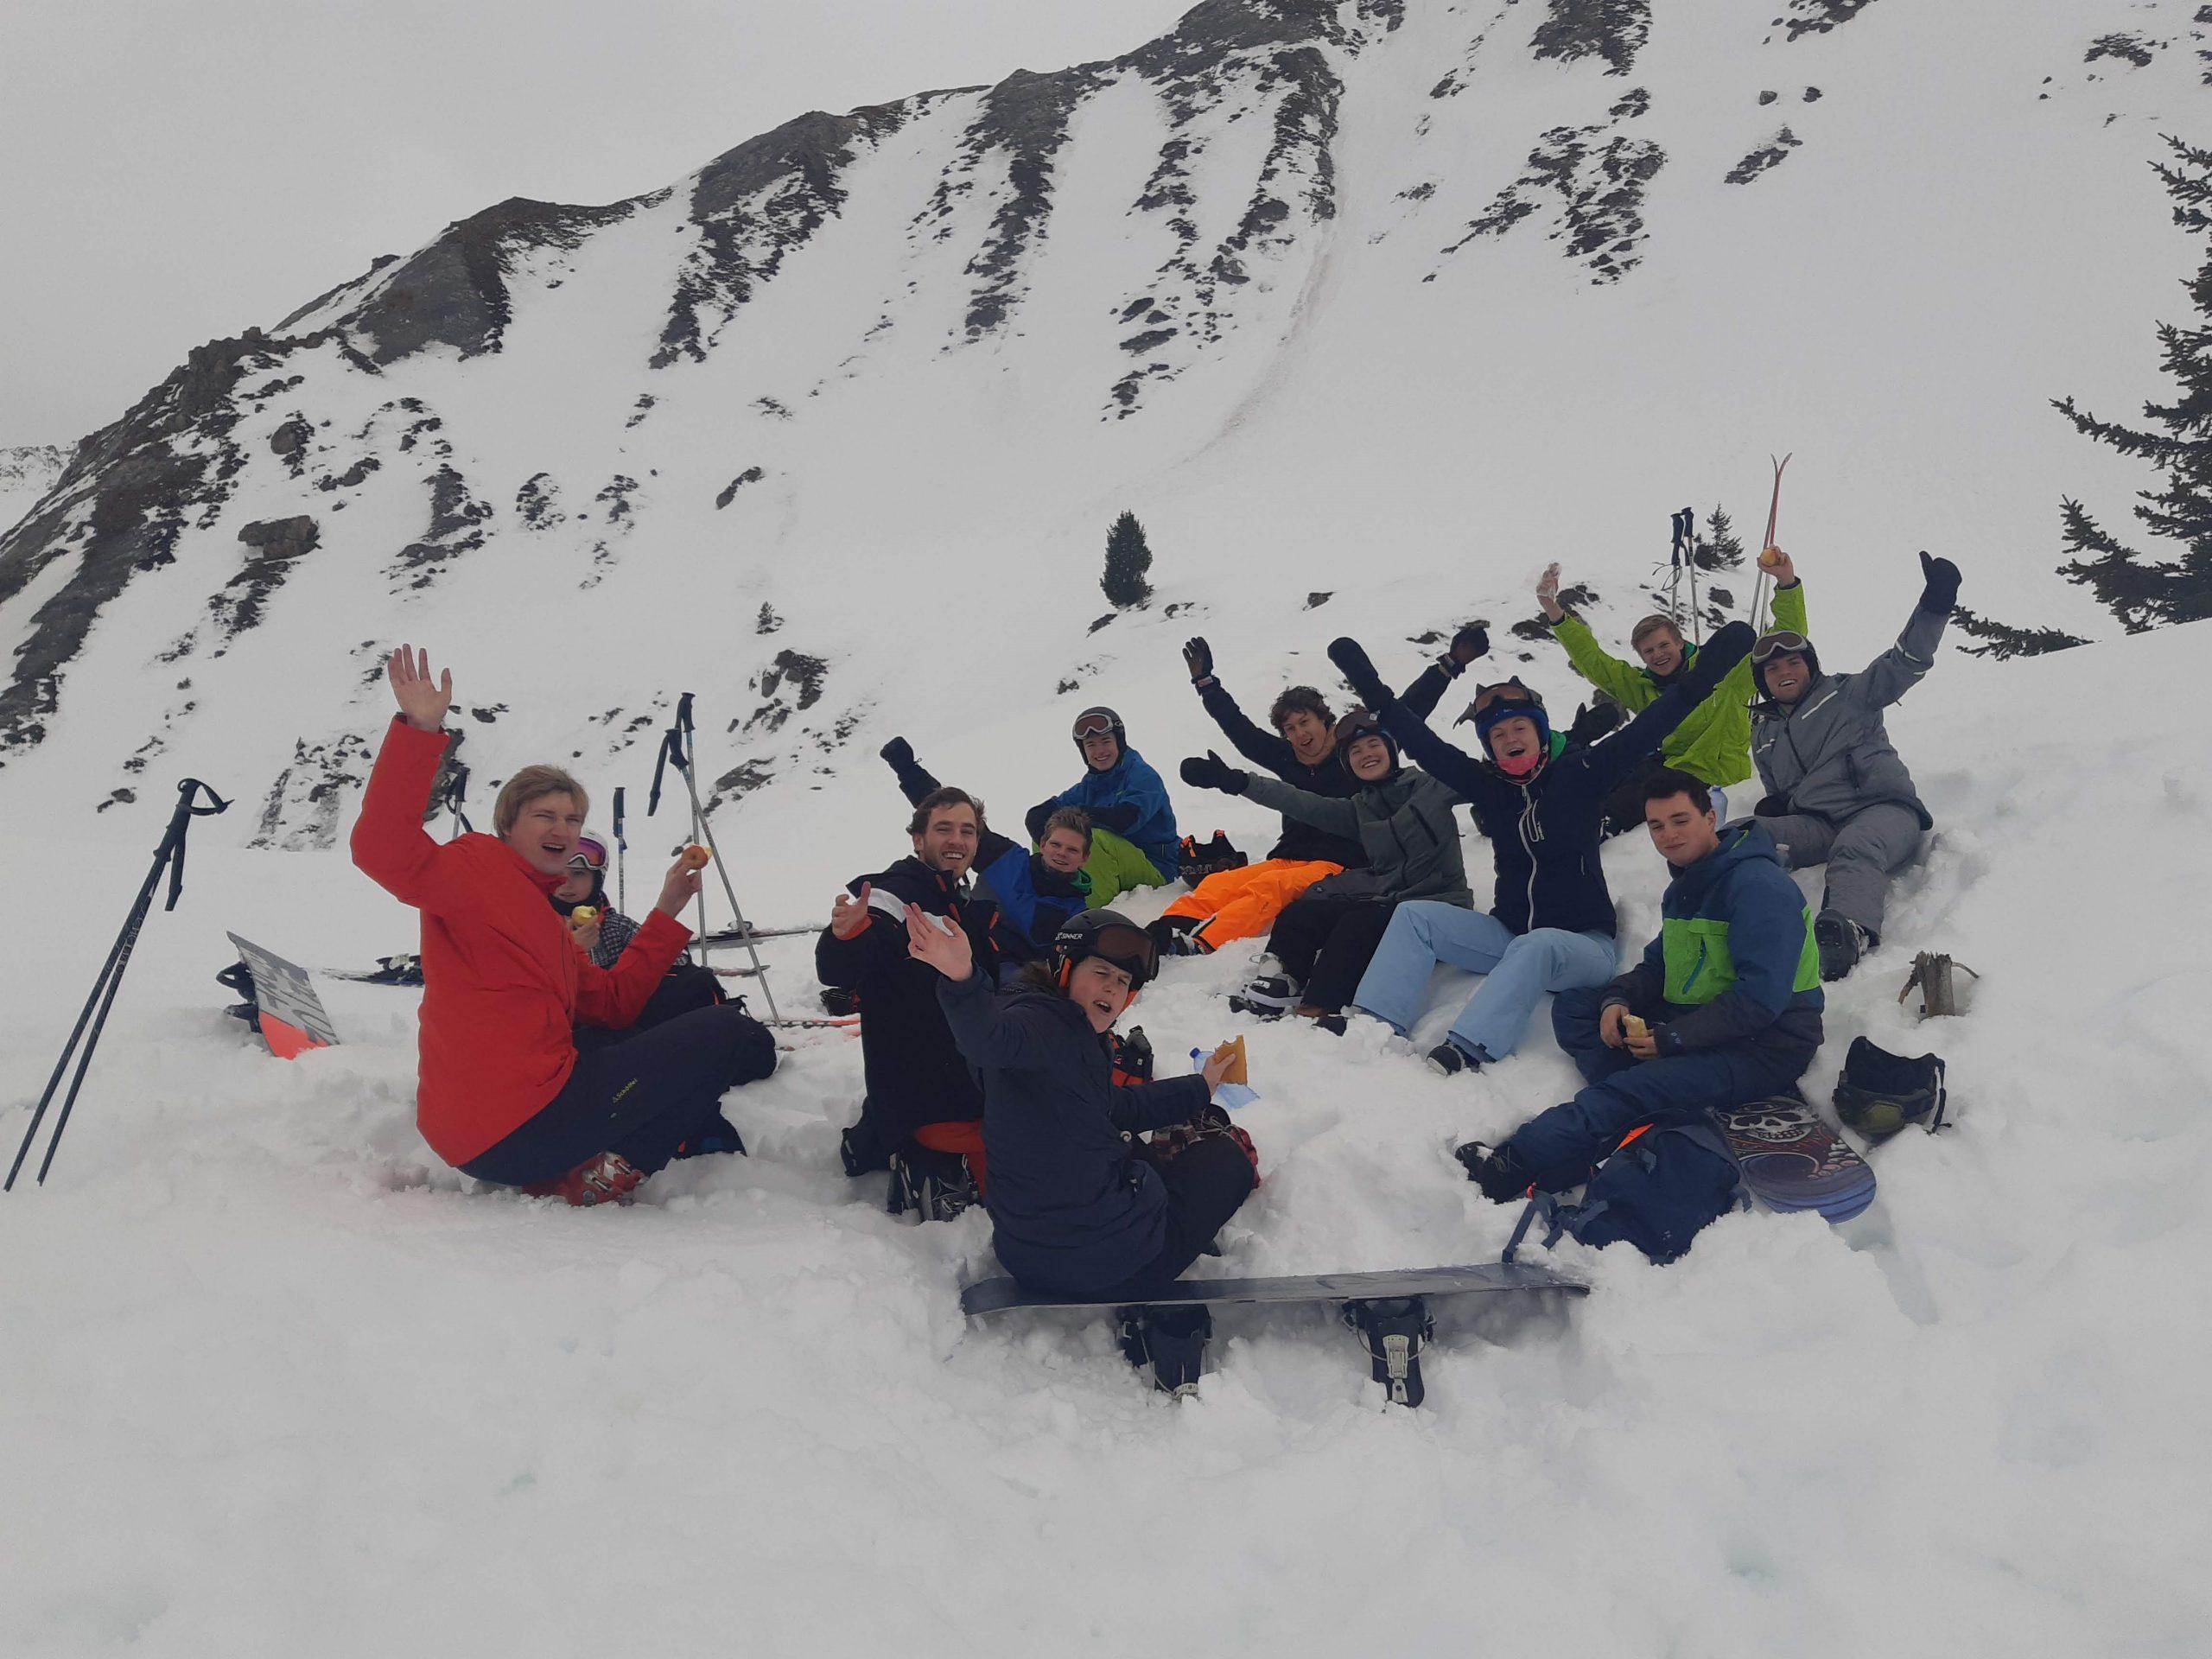 Skiën in de Alpen